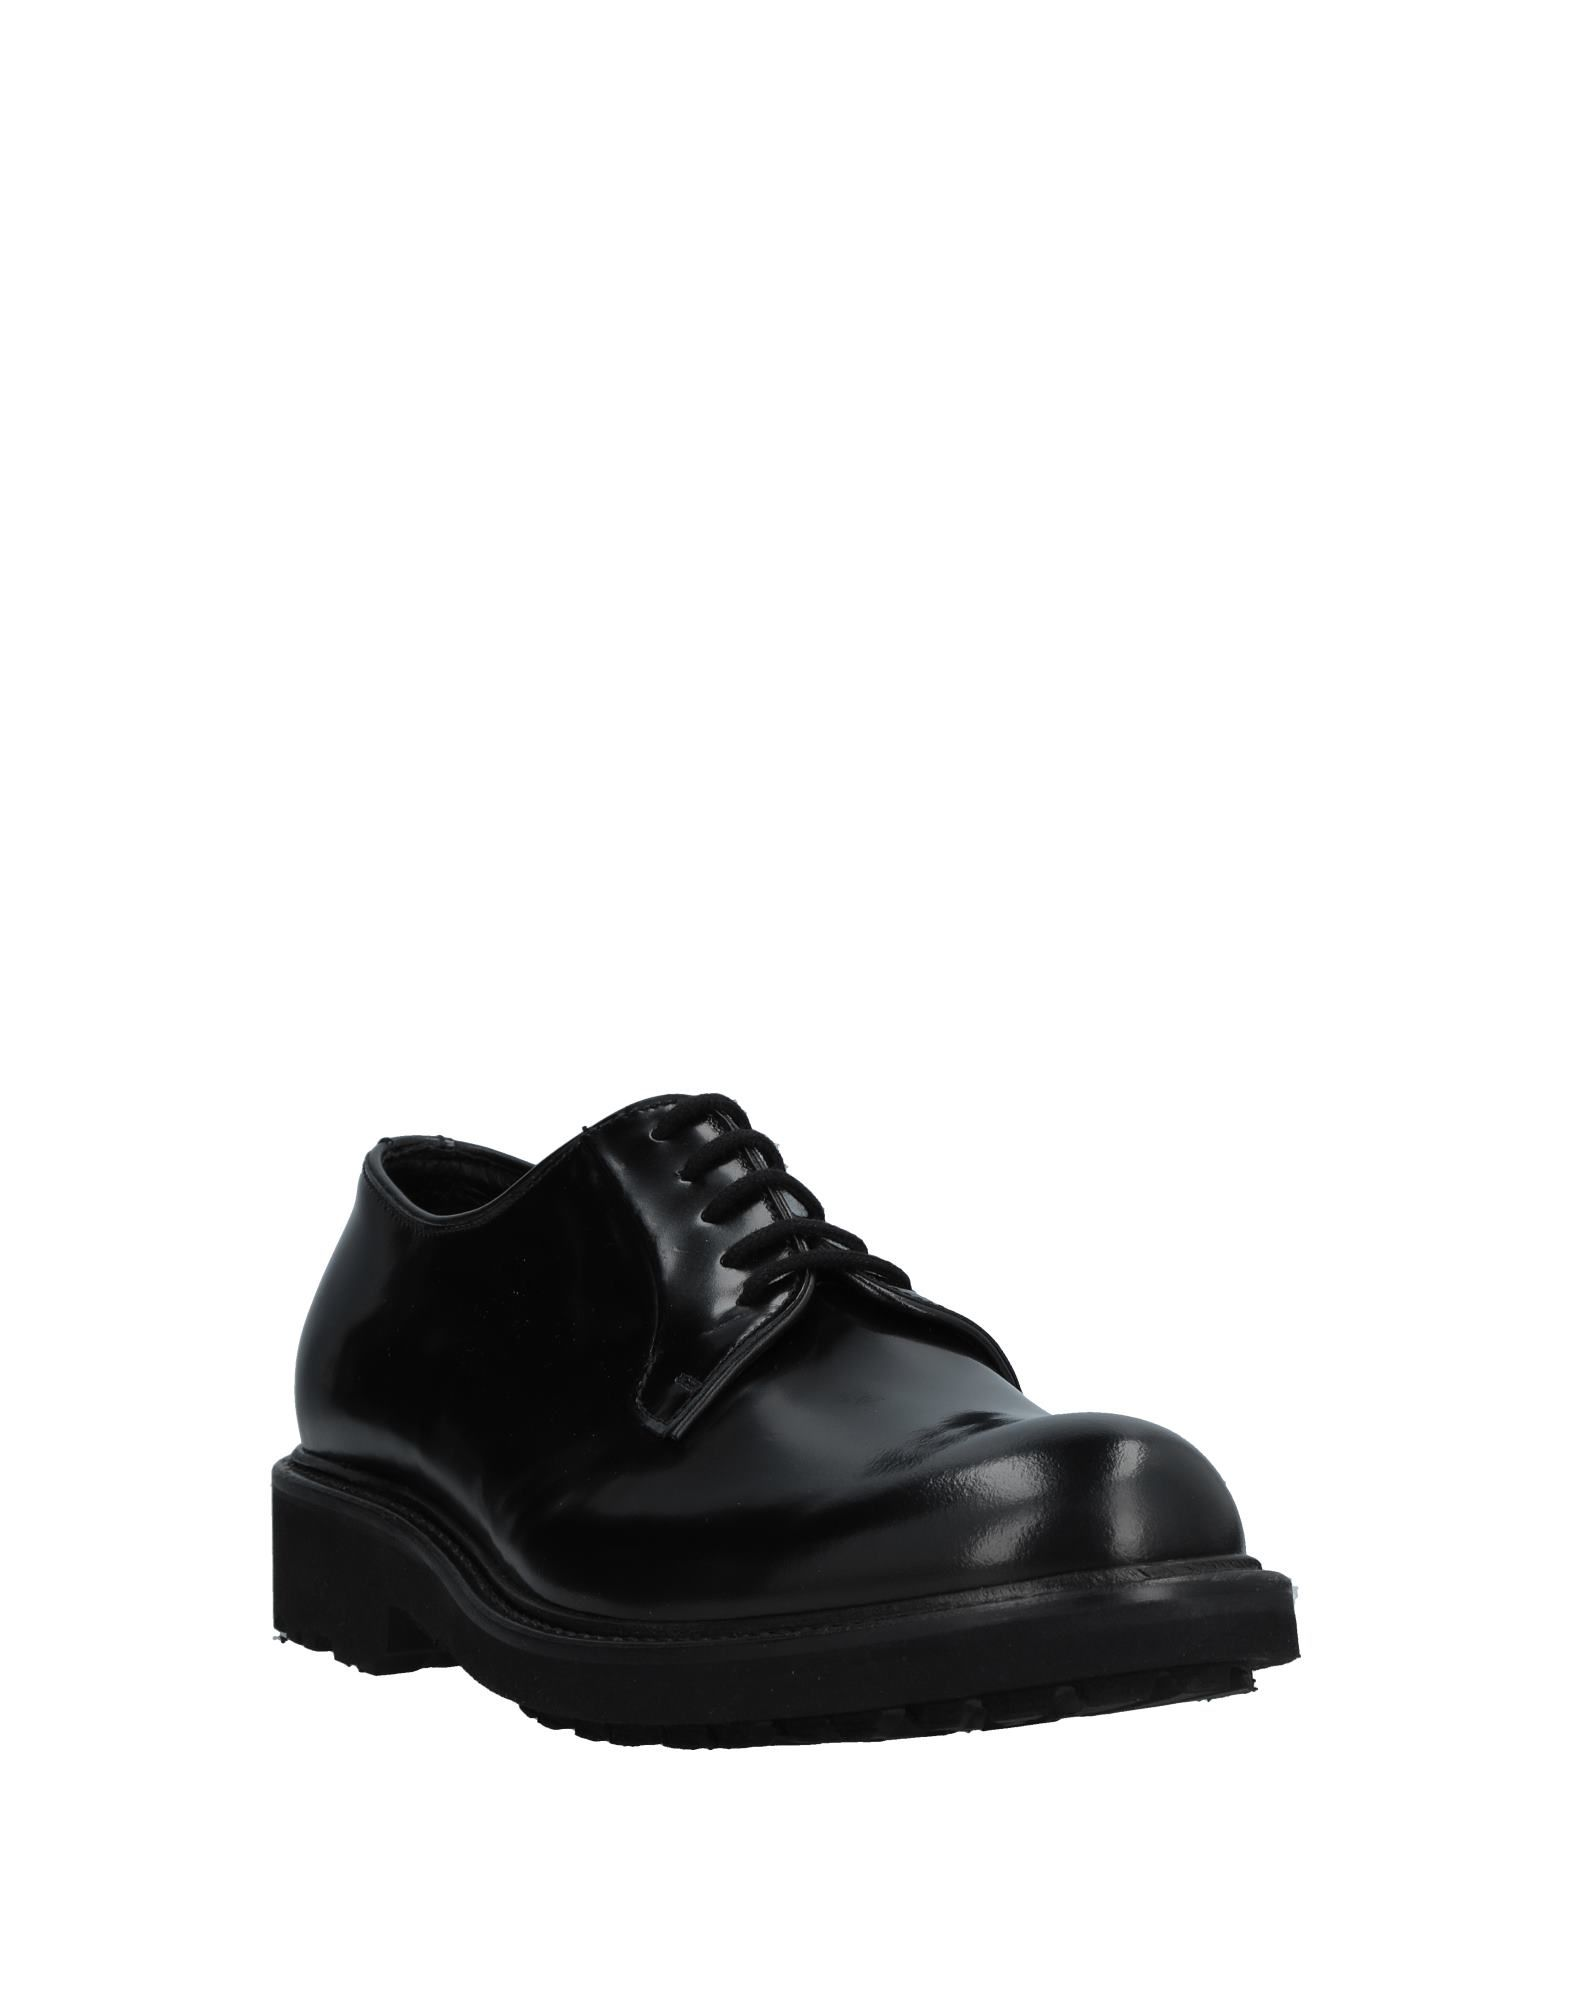 Rabatt Herren echte Schuhe Seboy's Schnürschuhe Herren Rabatt  11536353PV 36663d